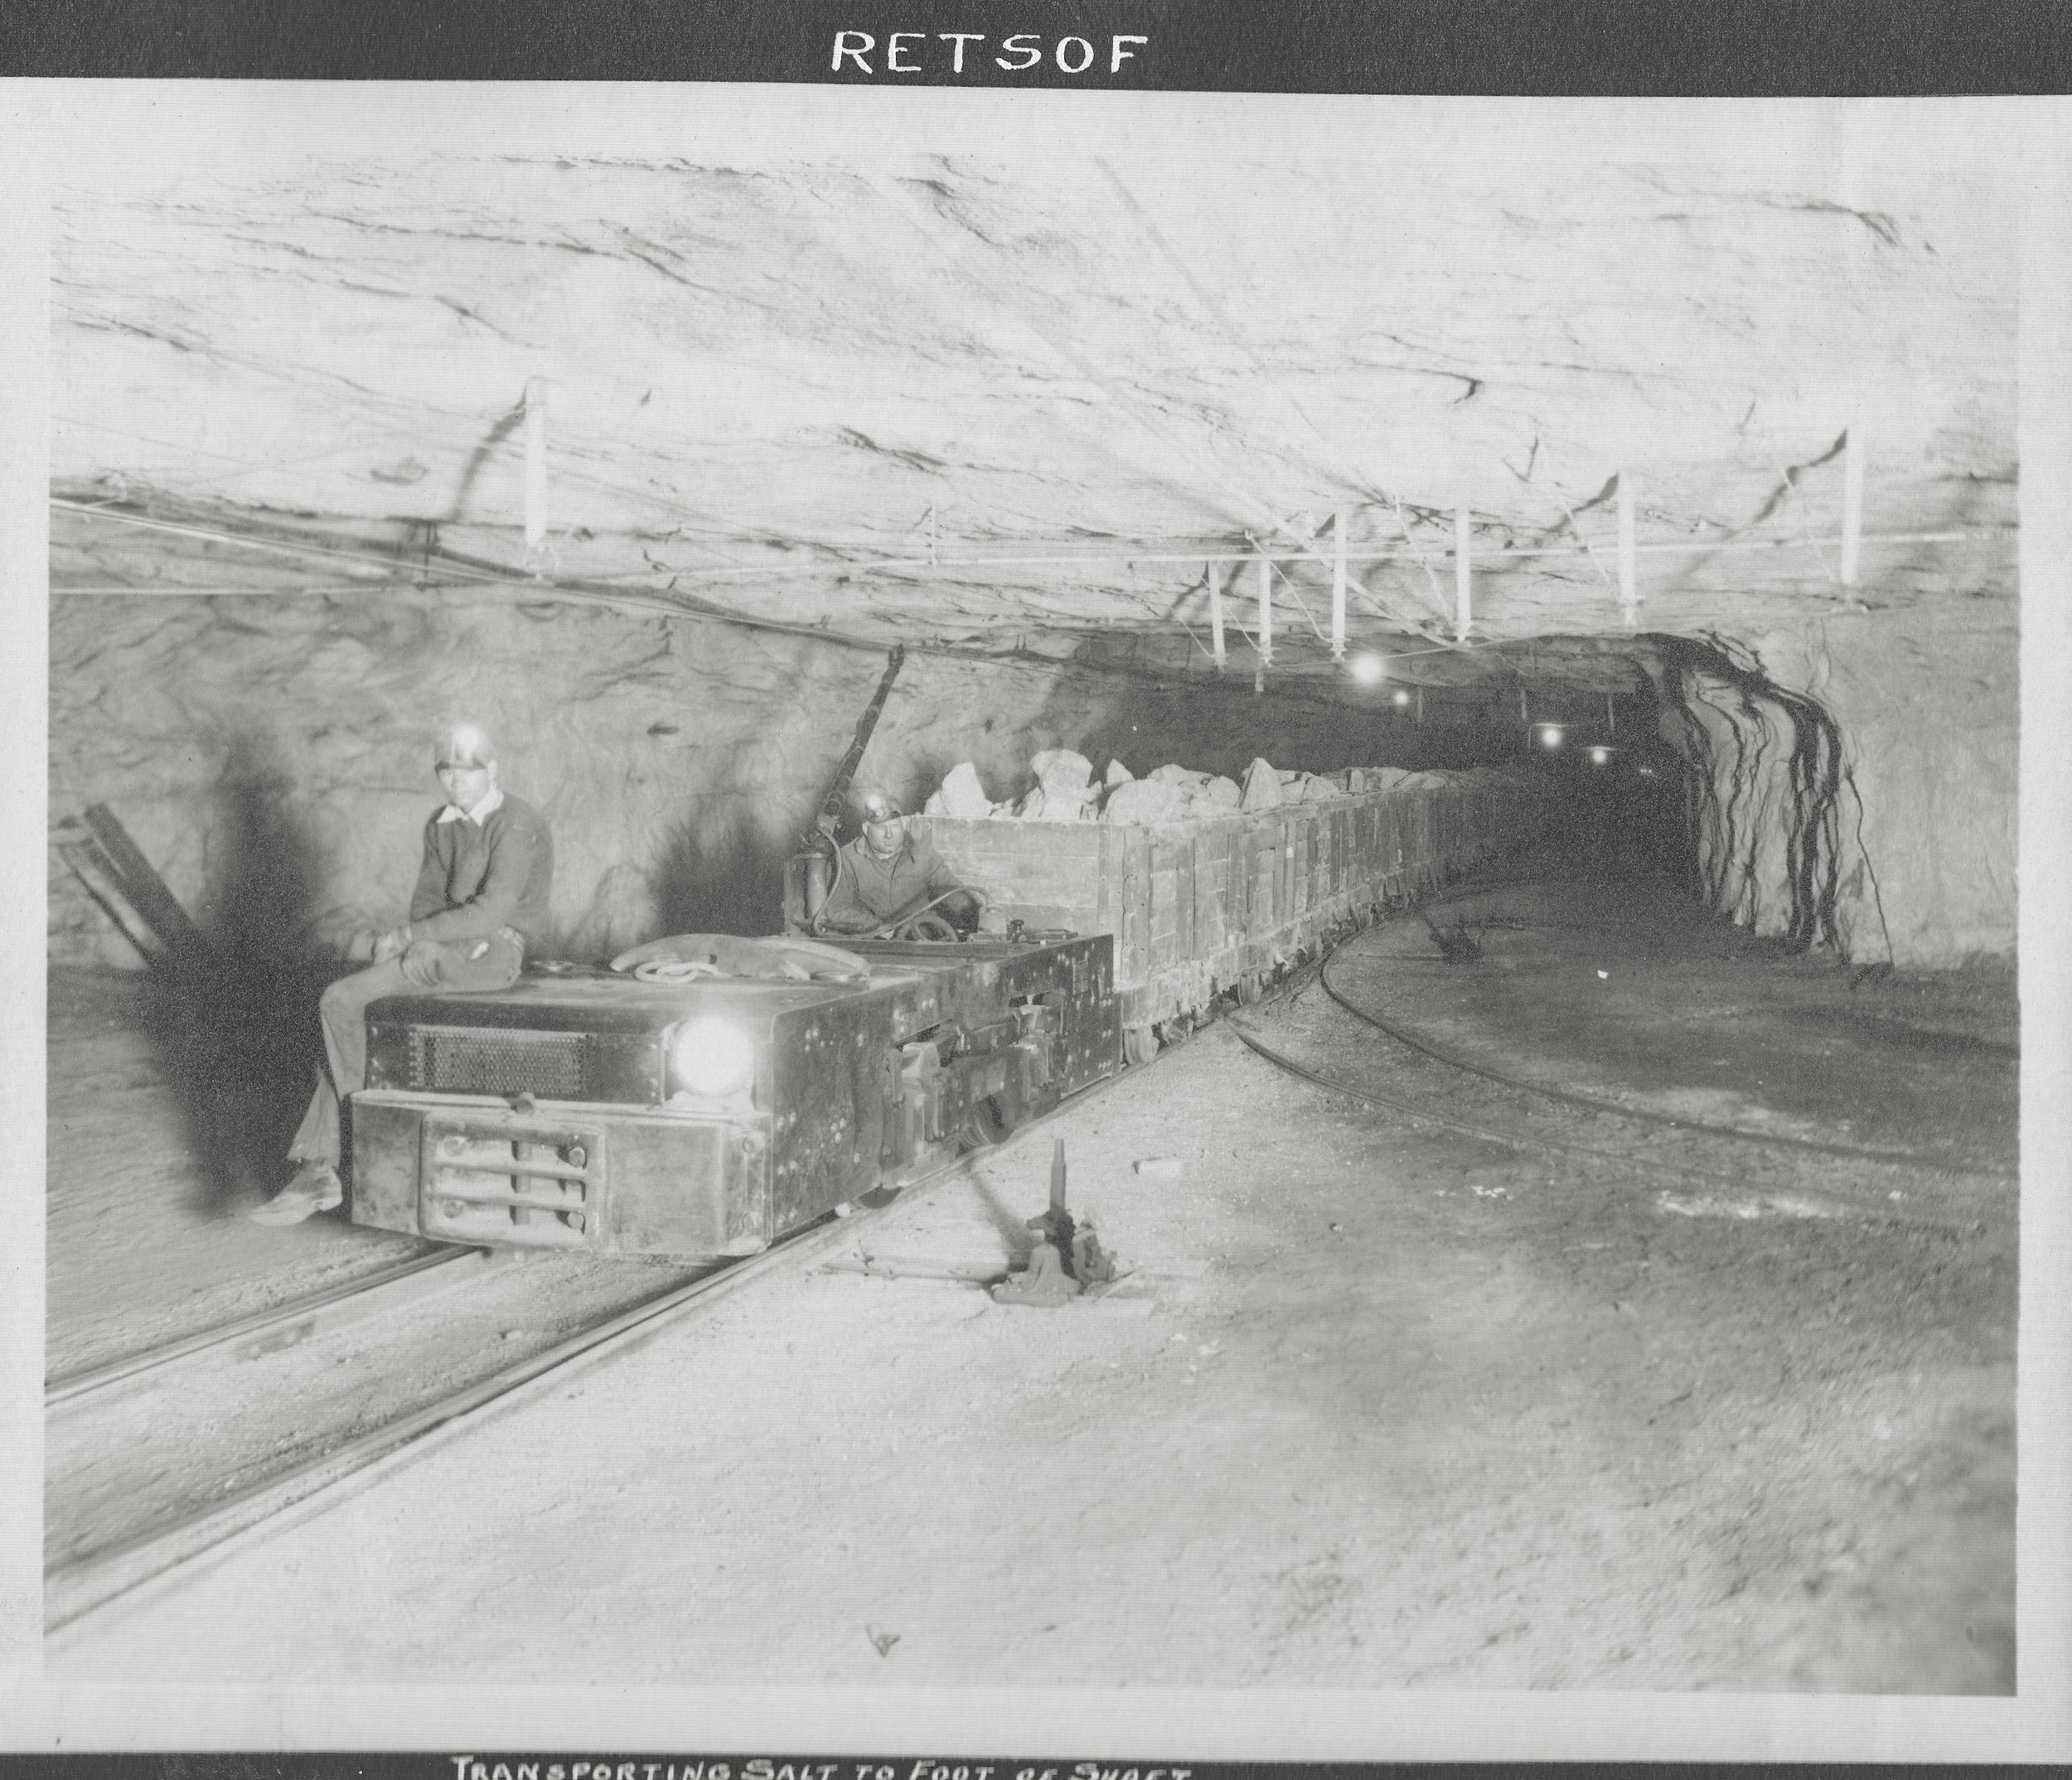 Transporting salt to foot of shaft in the Retsof Salt Mine.